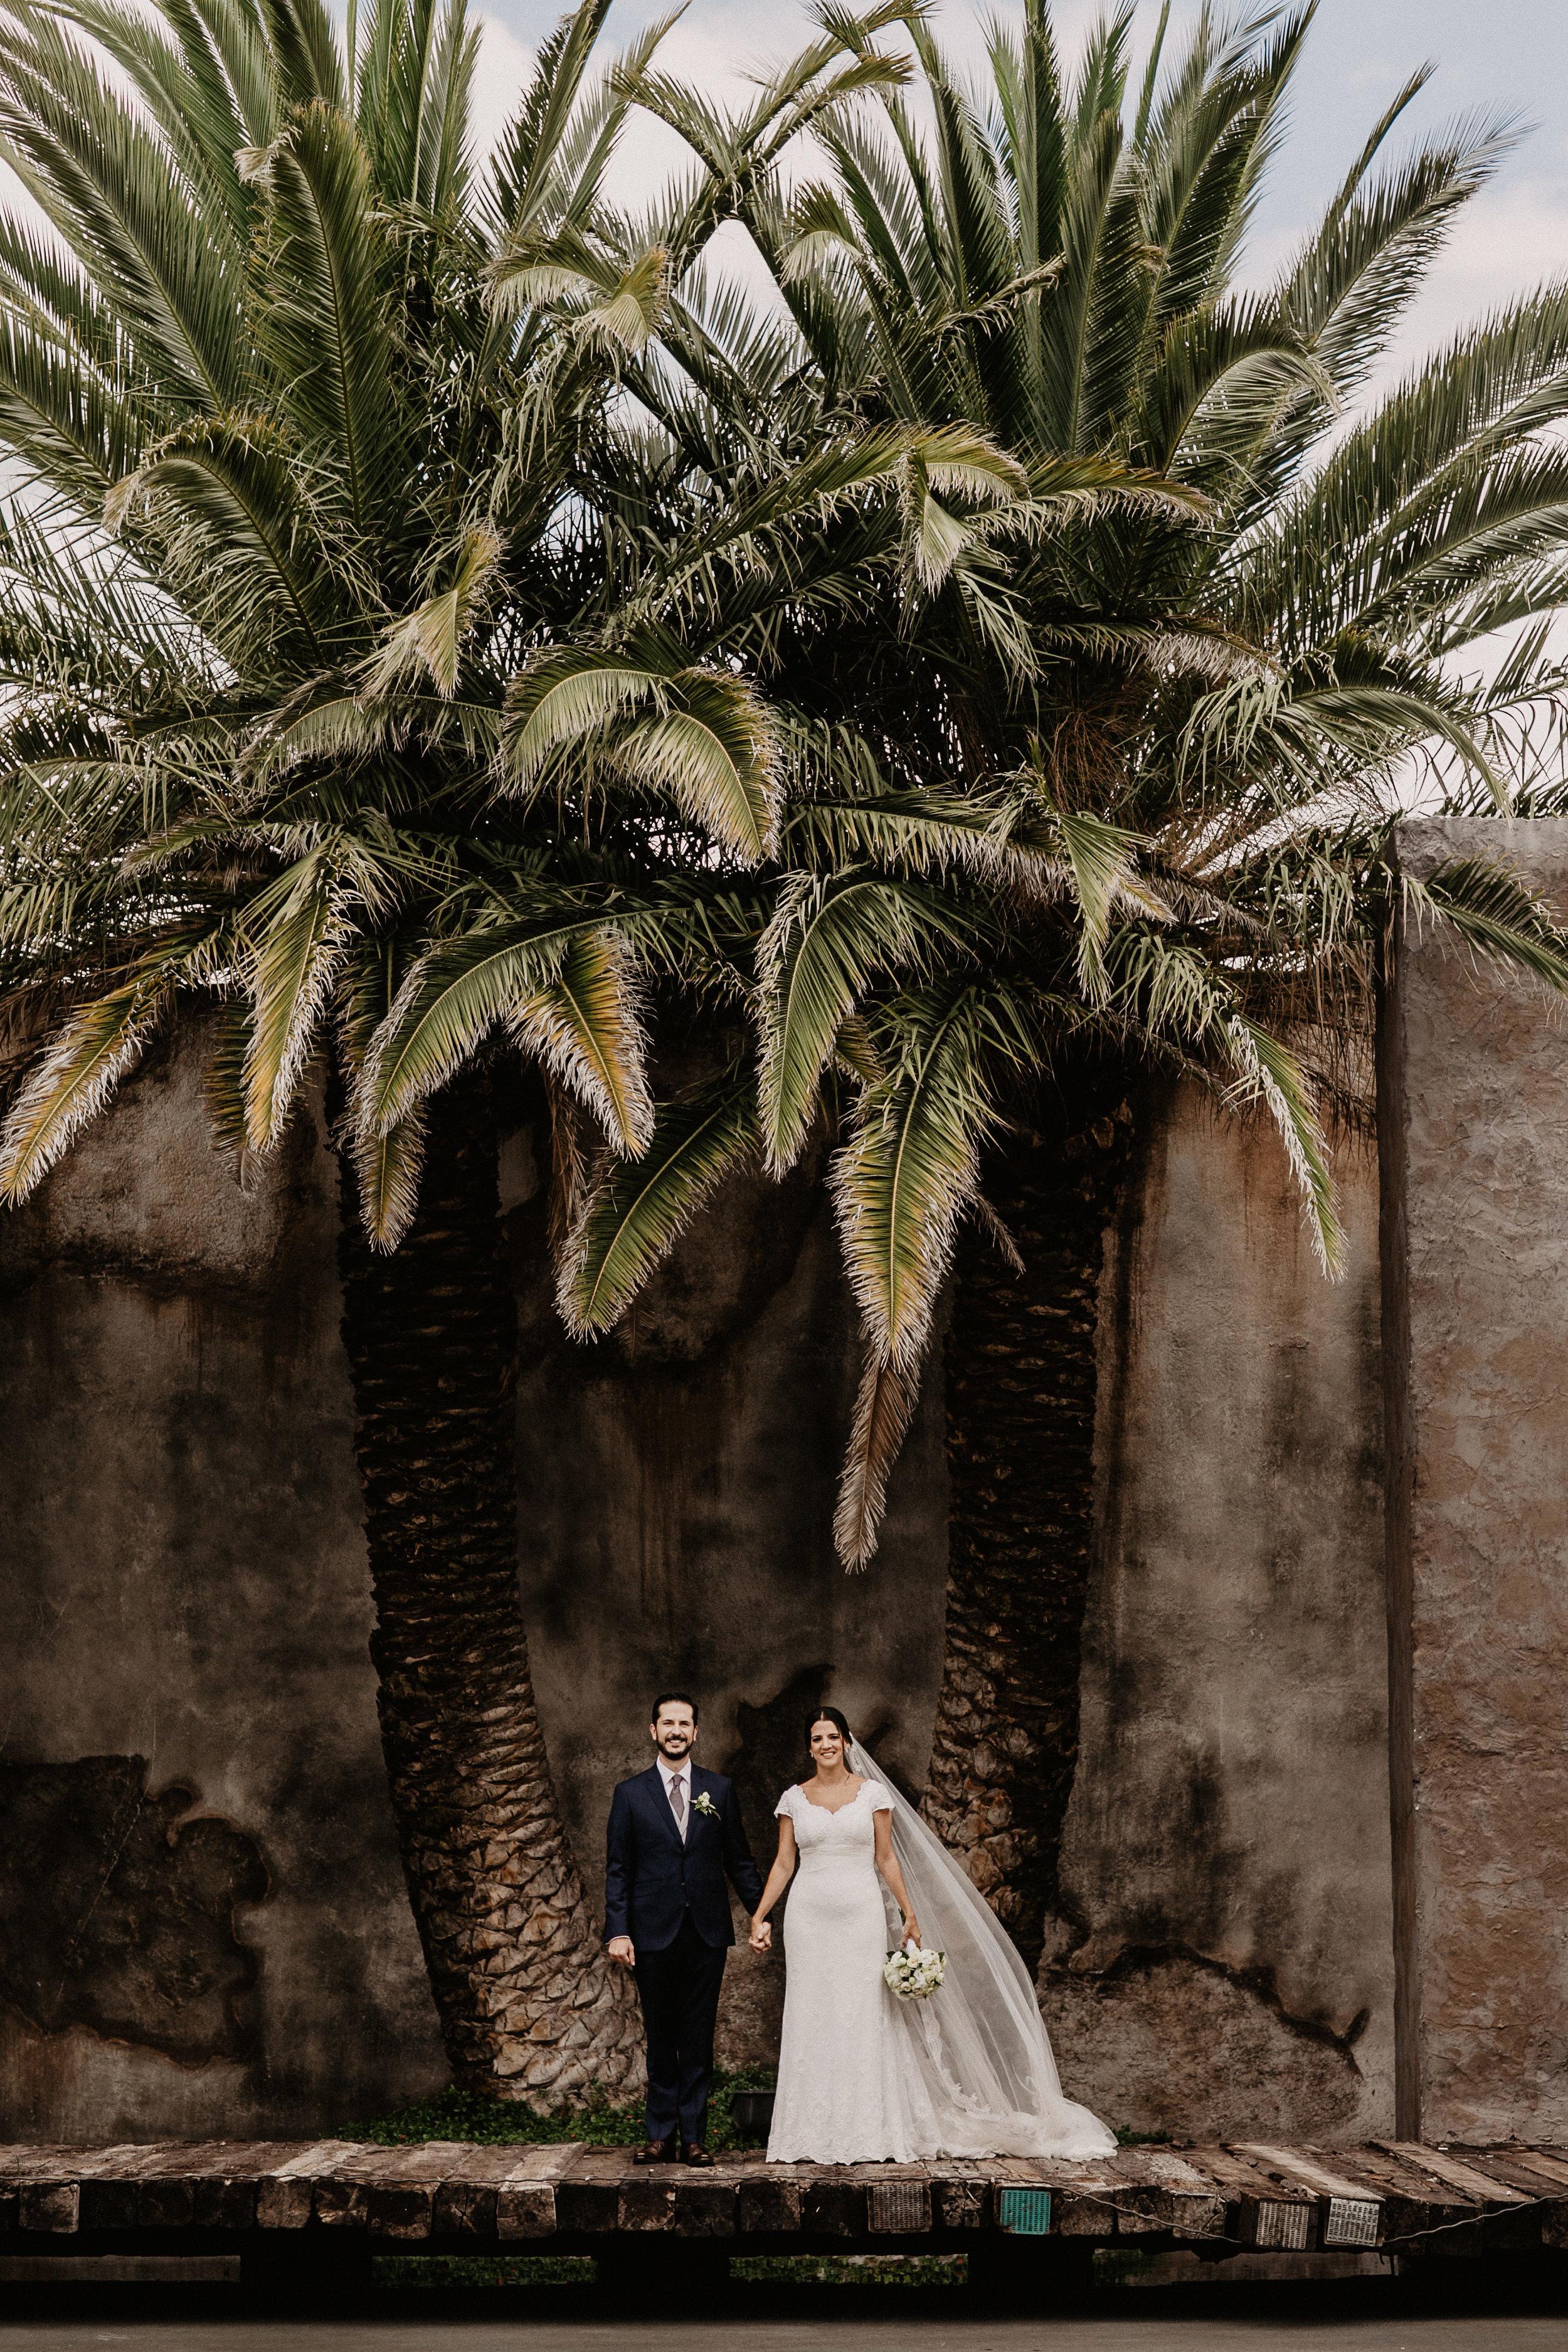 alfonso_flores_destination_wedding_photographer_pau_alonso_249.JPG